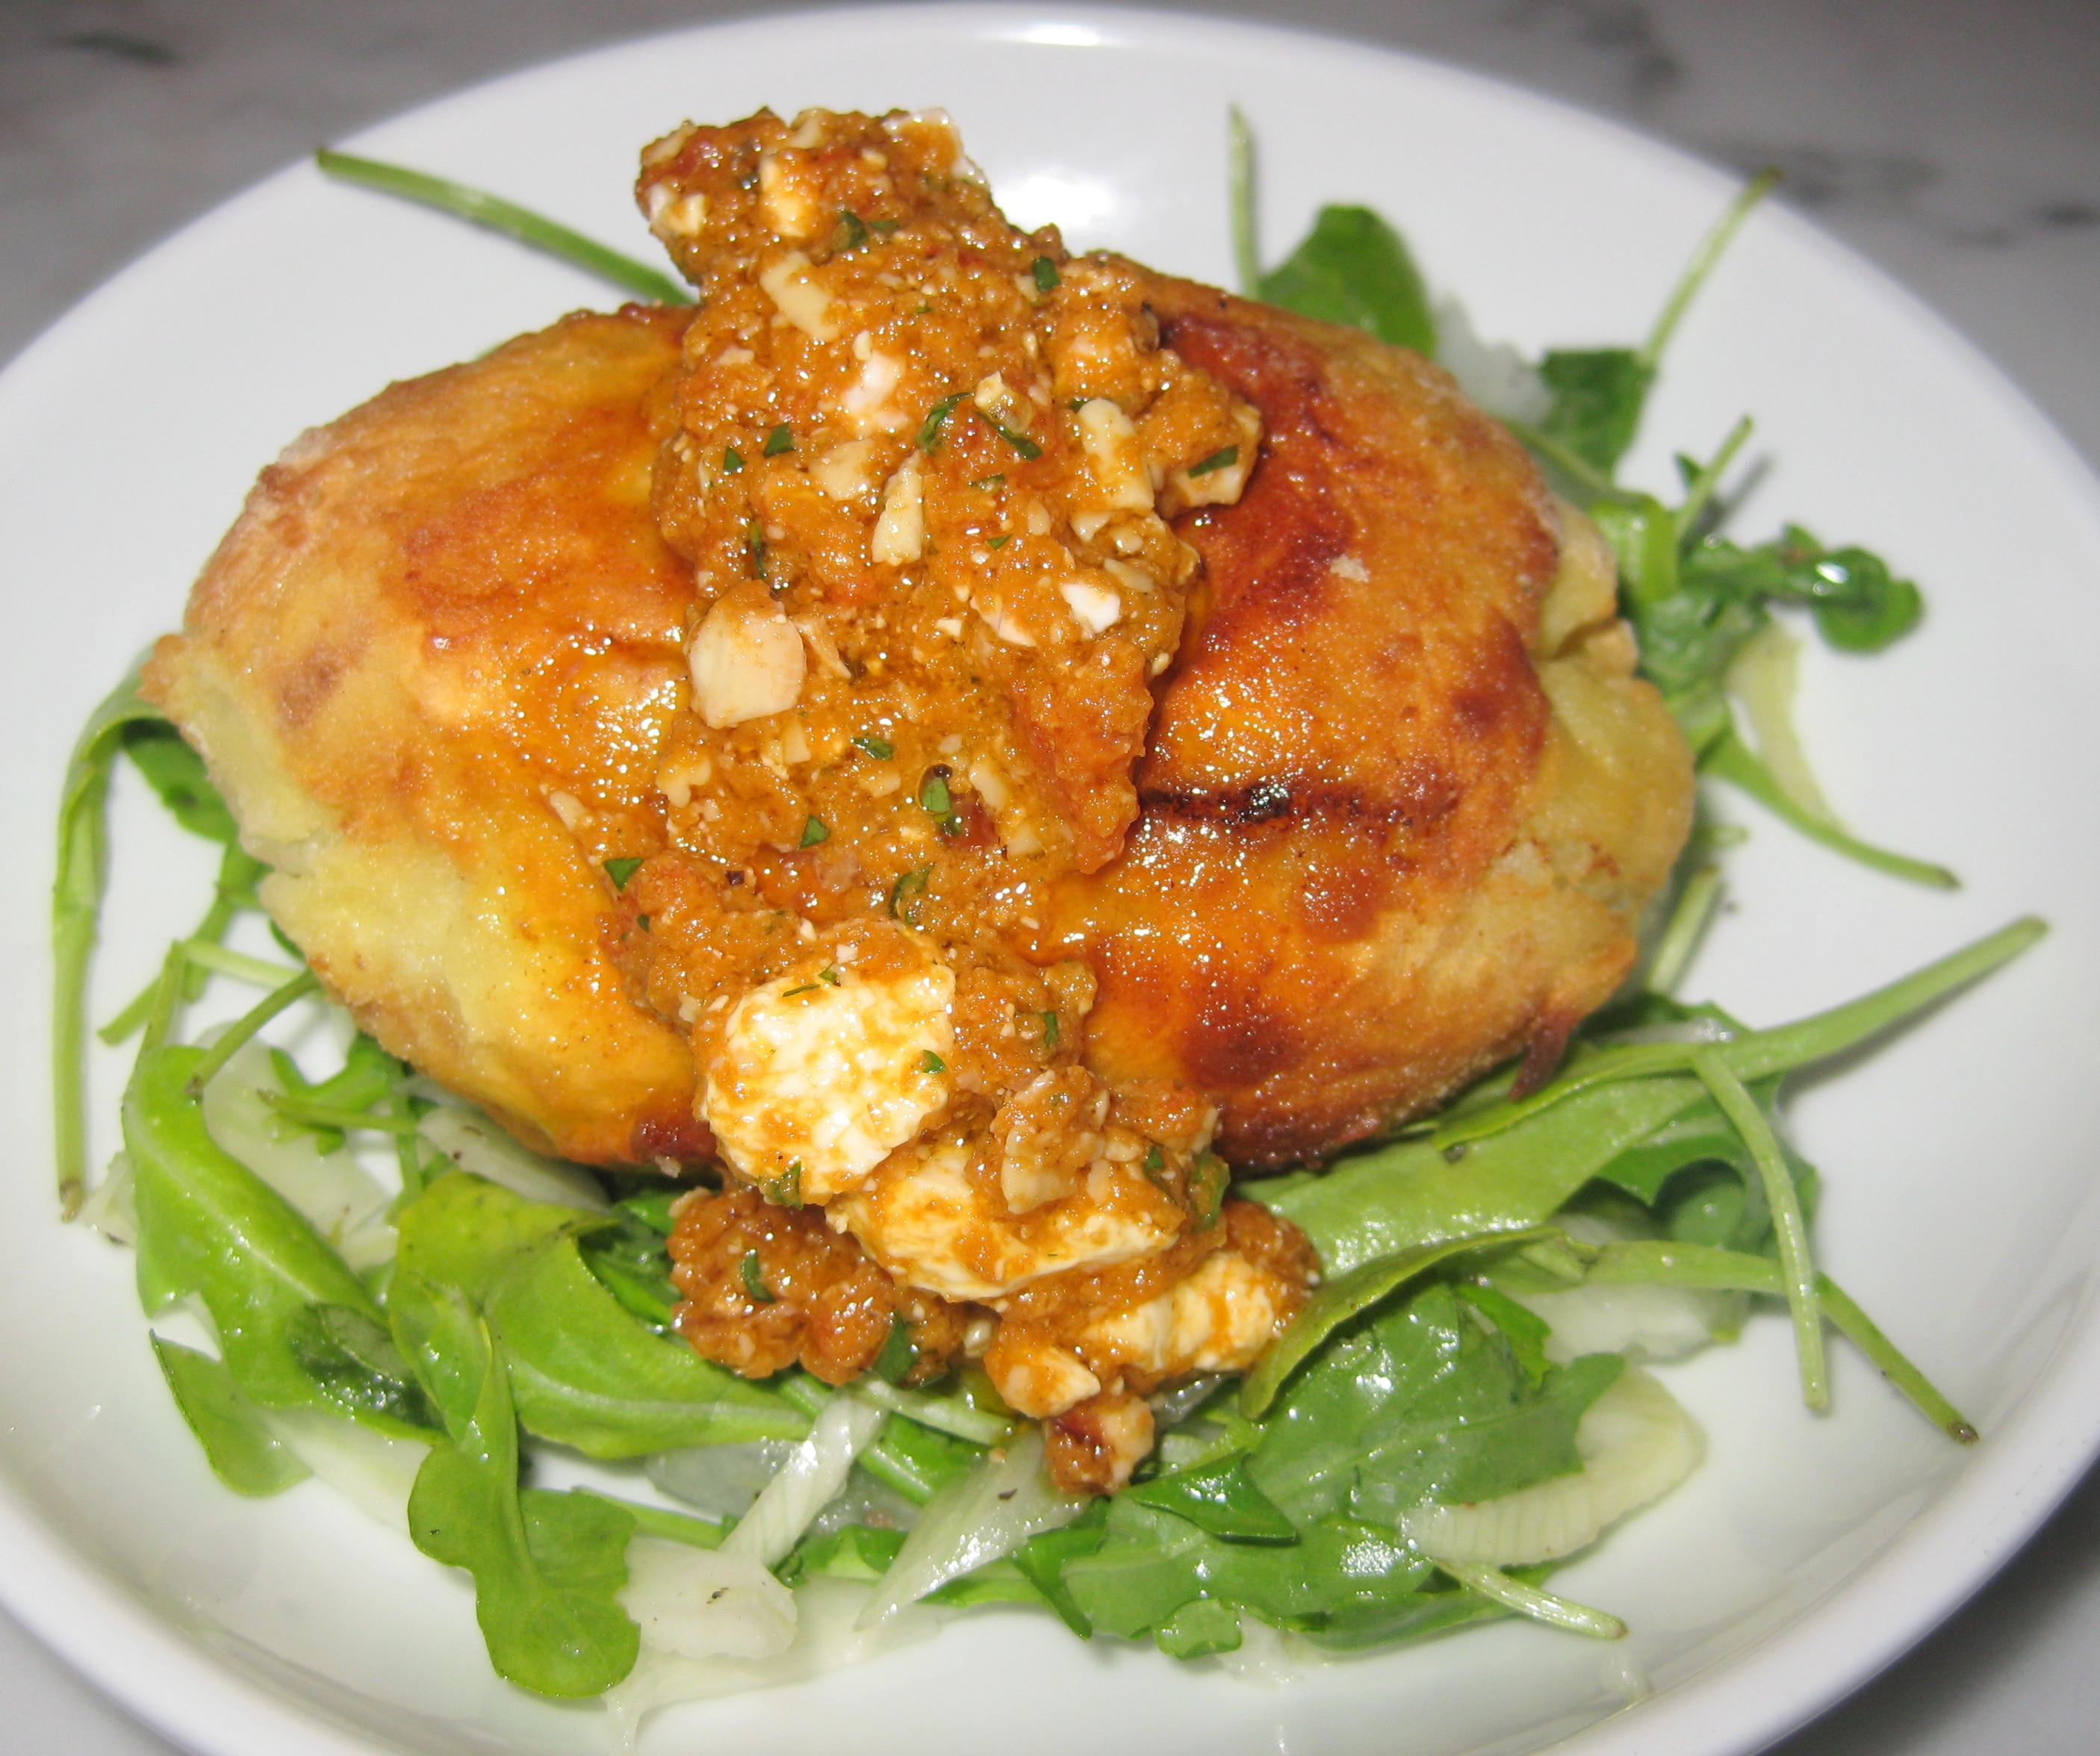 Papa rellena: stuffed potato, slow-cooked beef, boiled egg ...